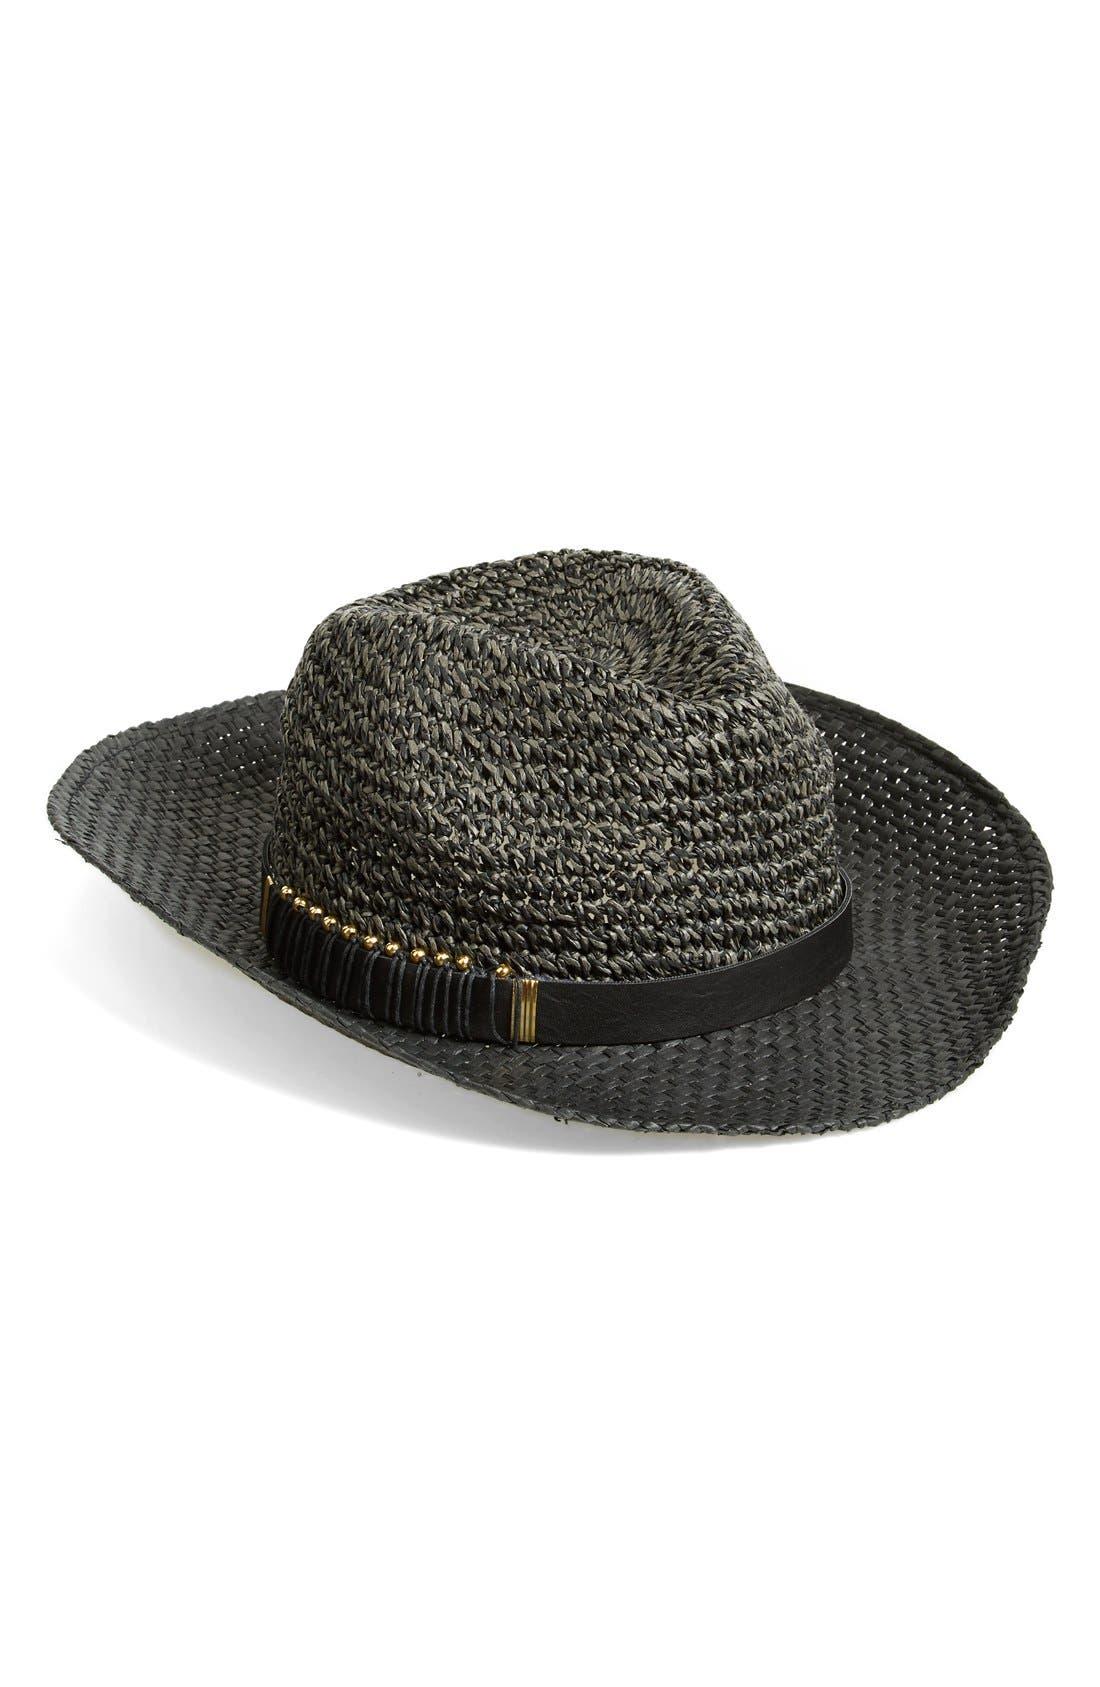 Main Image - Jessica Simpson Metal Accented Panama Hat